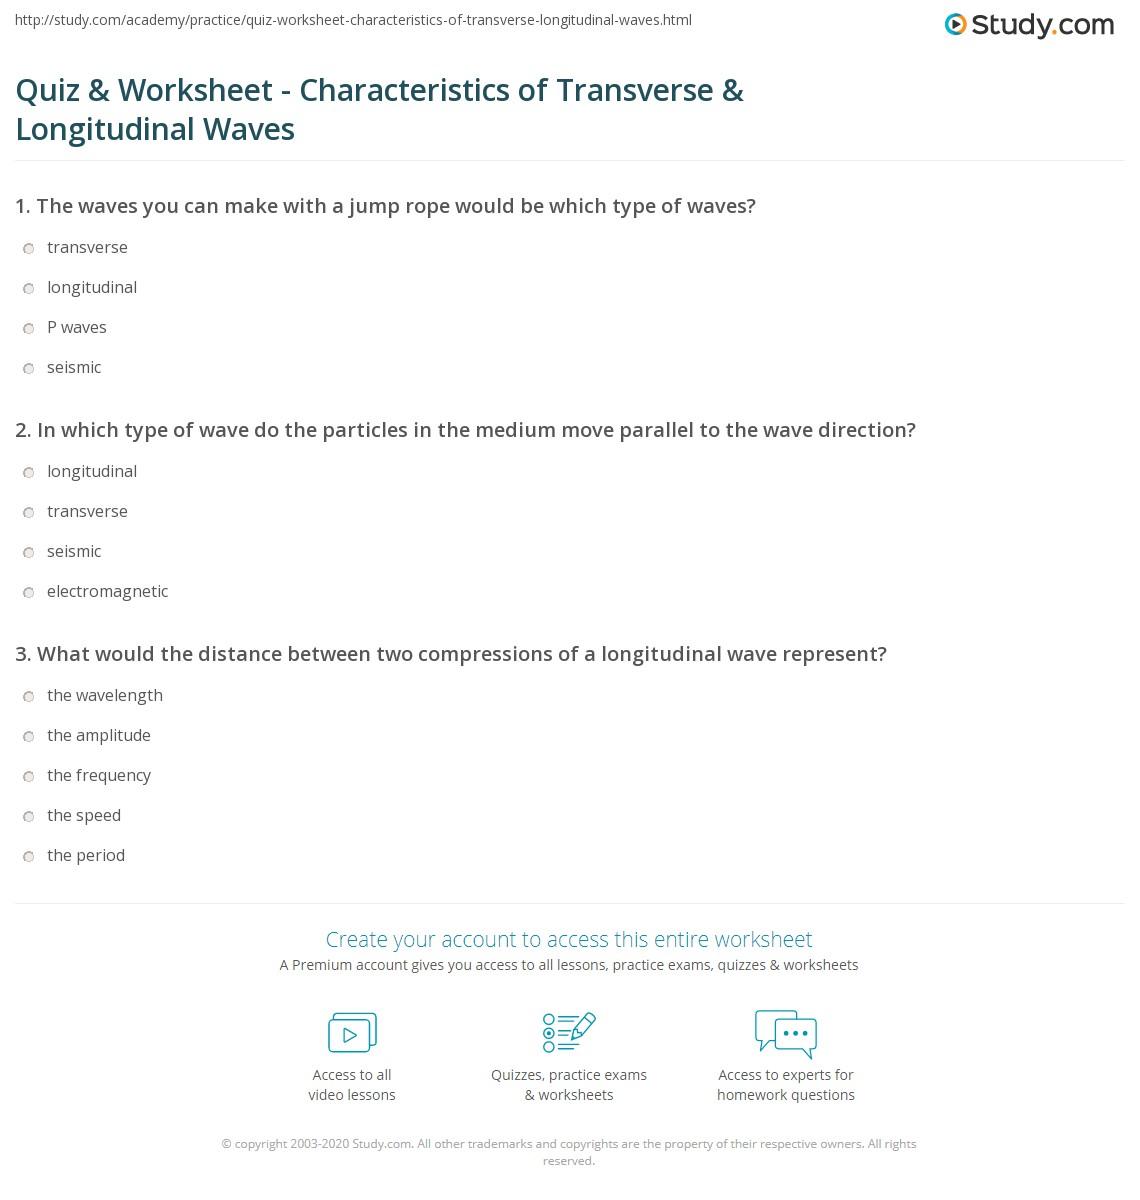 Transverse And Longitudinal Waves Worksheet Answers - Intrepidpath